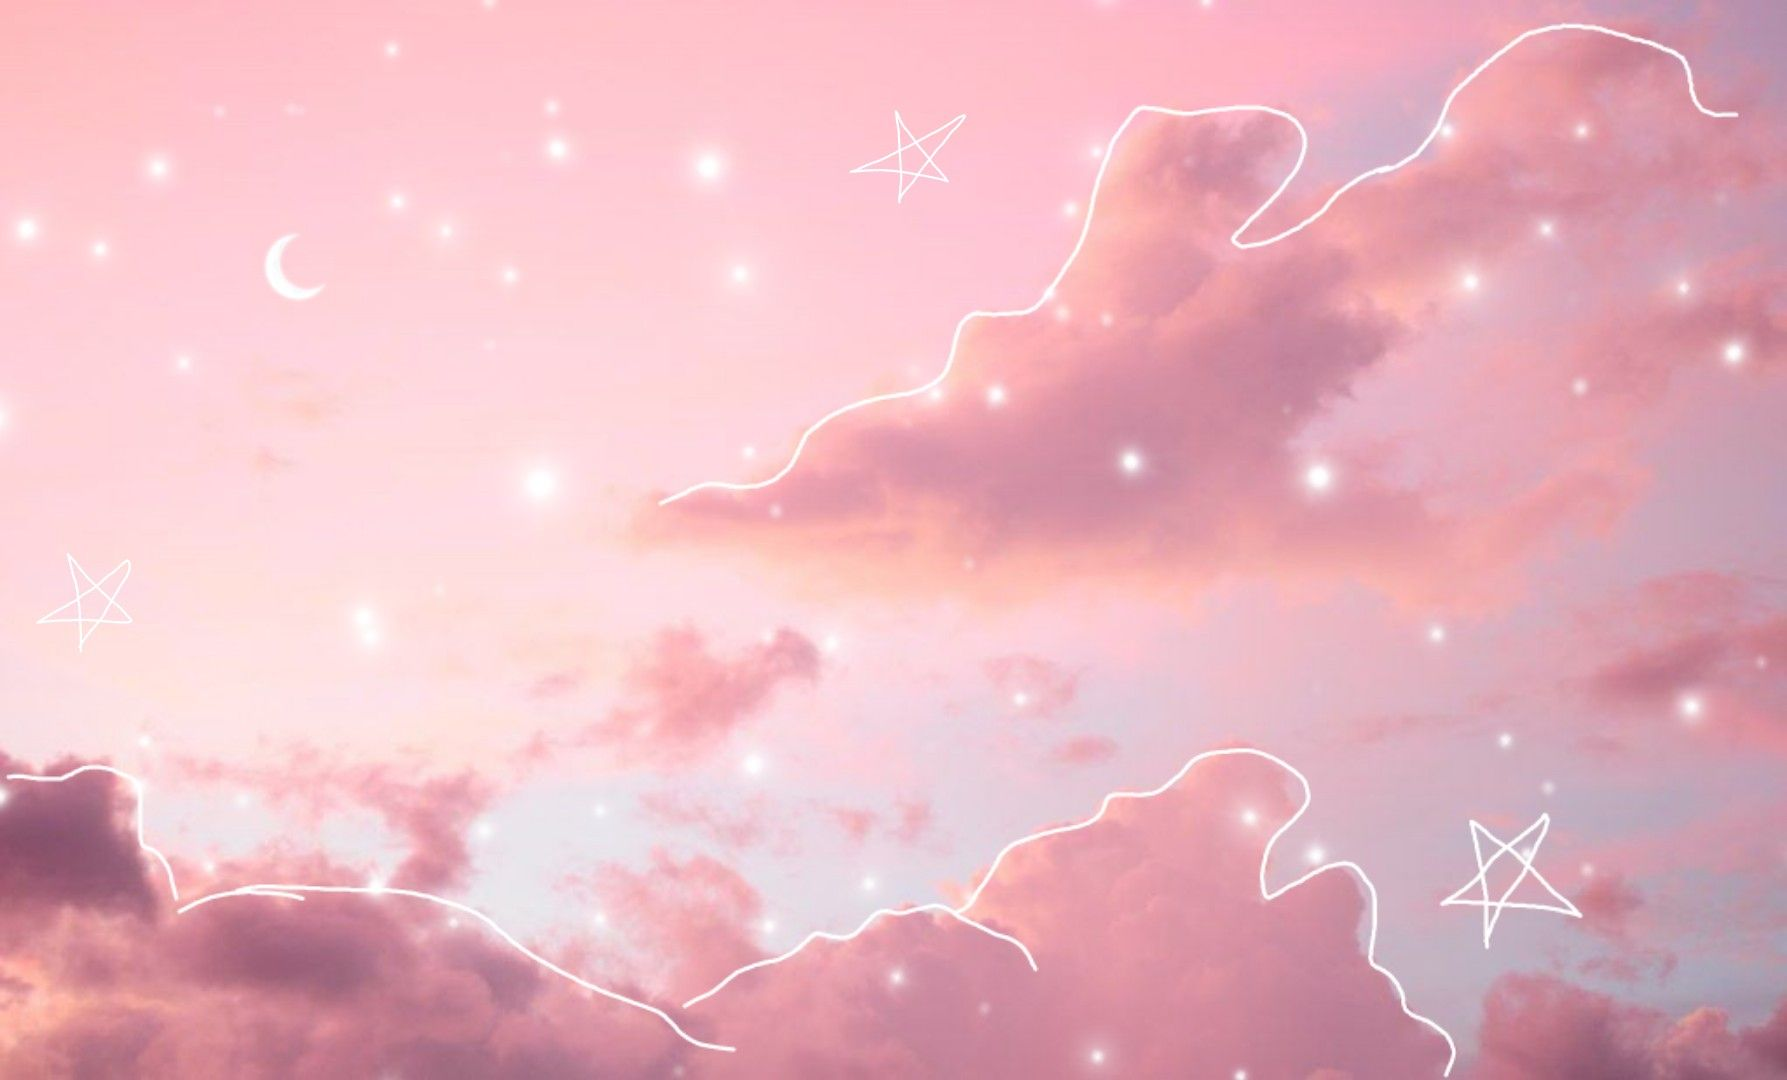 Cute Lofi Pink Wallpaper Laptop Pink Clouds Wallpaper Minimalist Desktop Wallpaper Aesthetic pink clouds wallpaper laptop